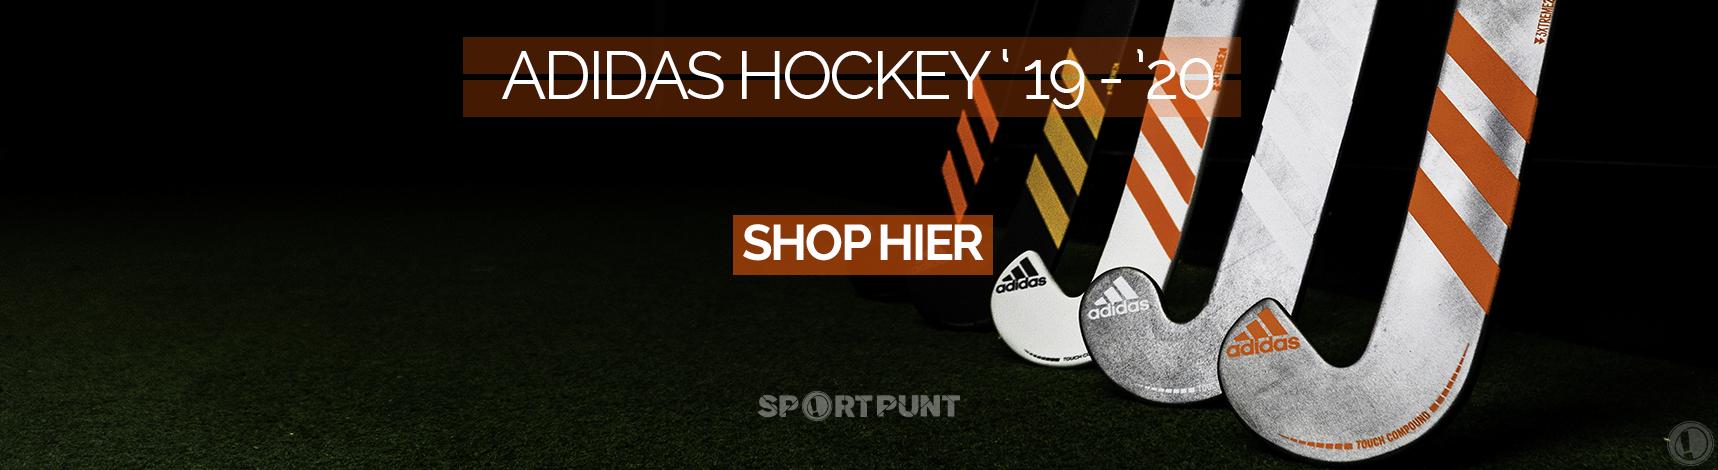 Adidas Hockey '19-' 20